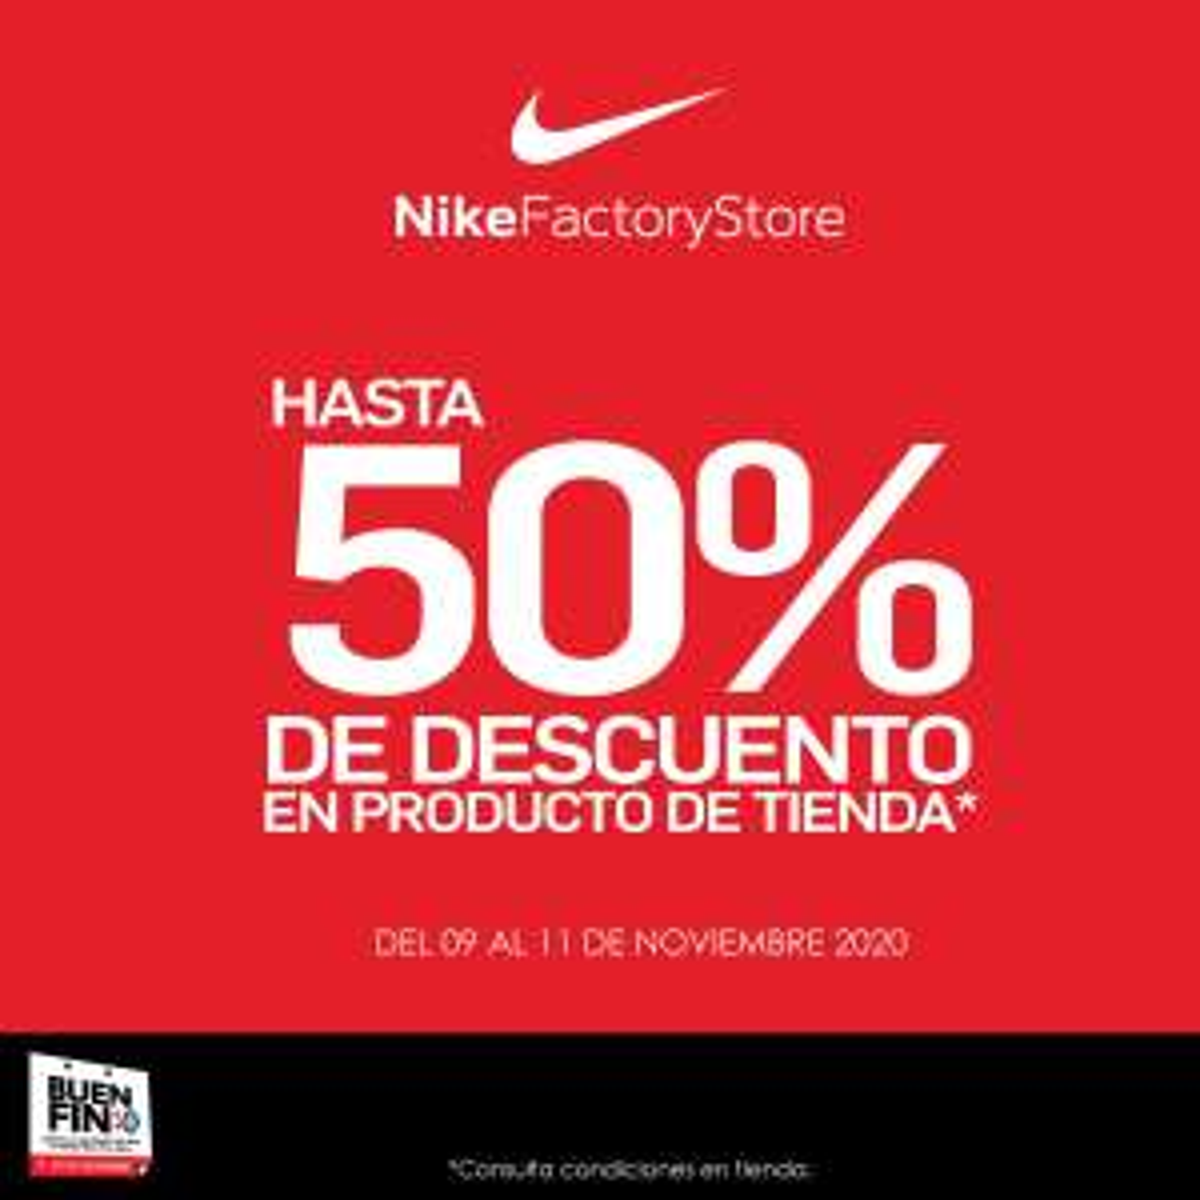 Buen fin Nike factory store: 50% de descuento